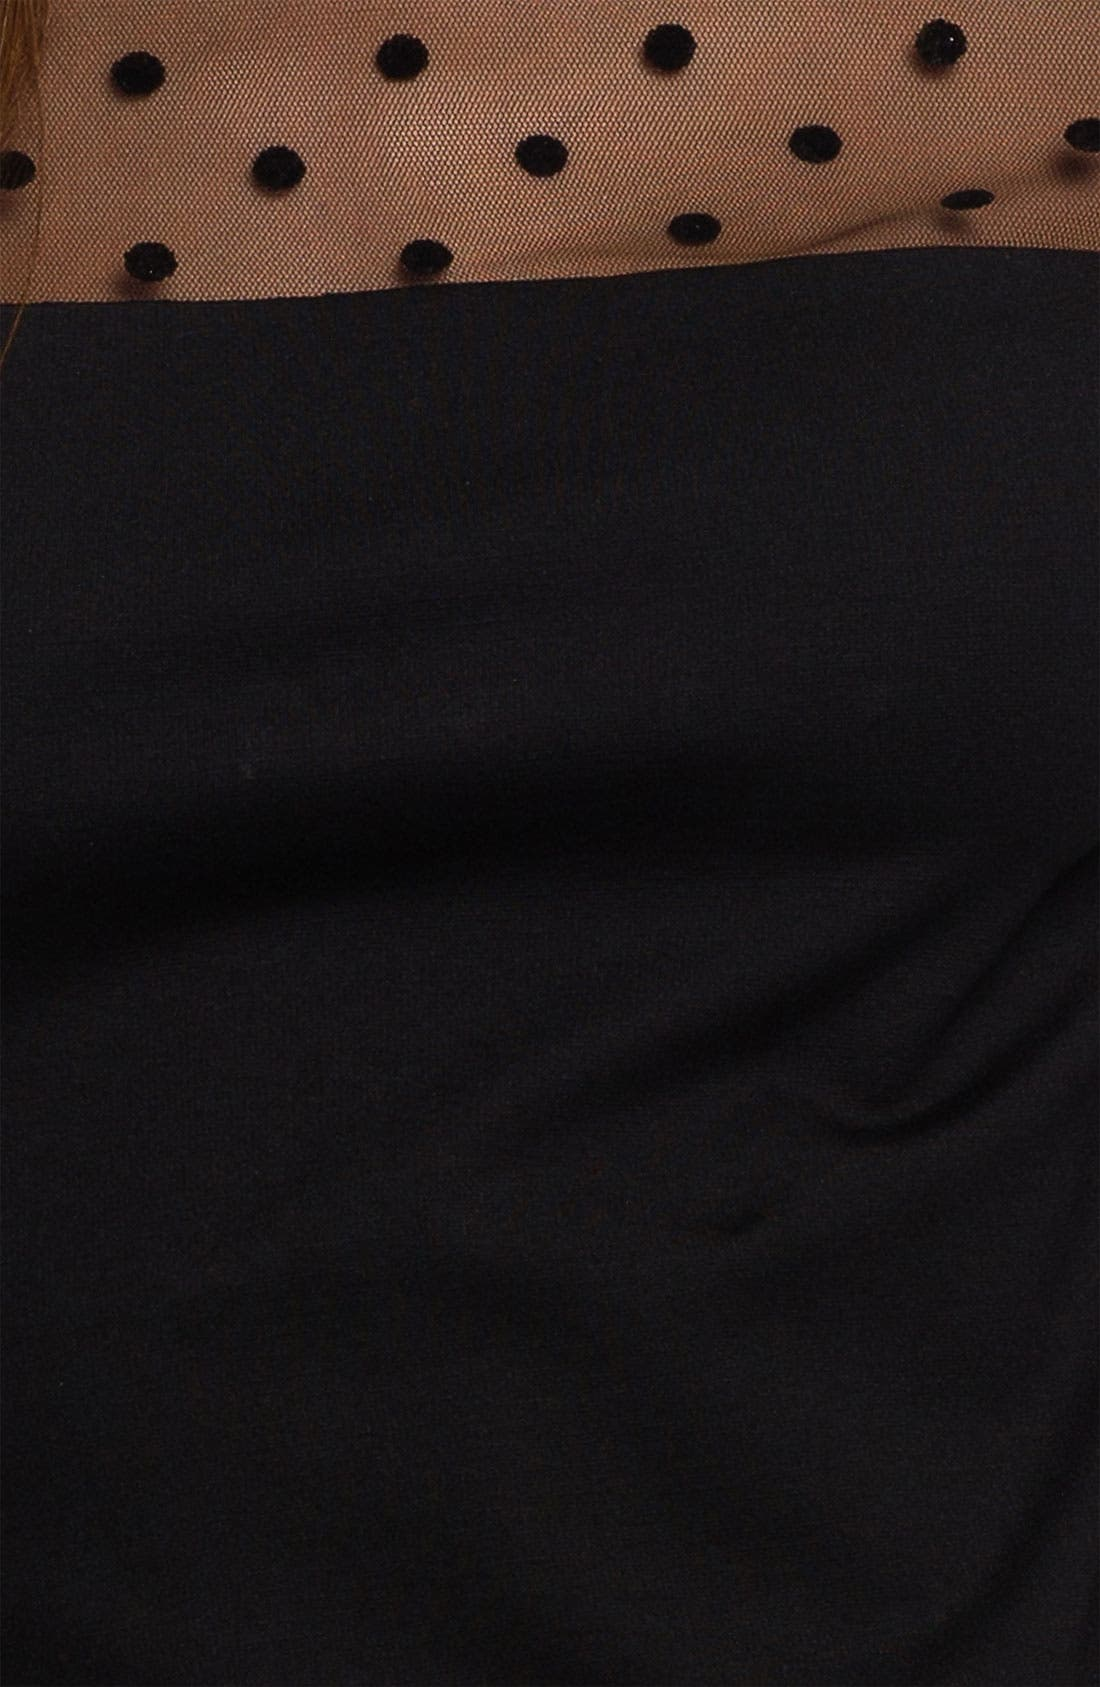 Alternate Image 3  - Vince Camuto Dot Illusion Dress (Online Exclusive)